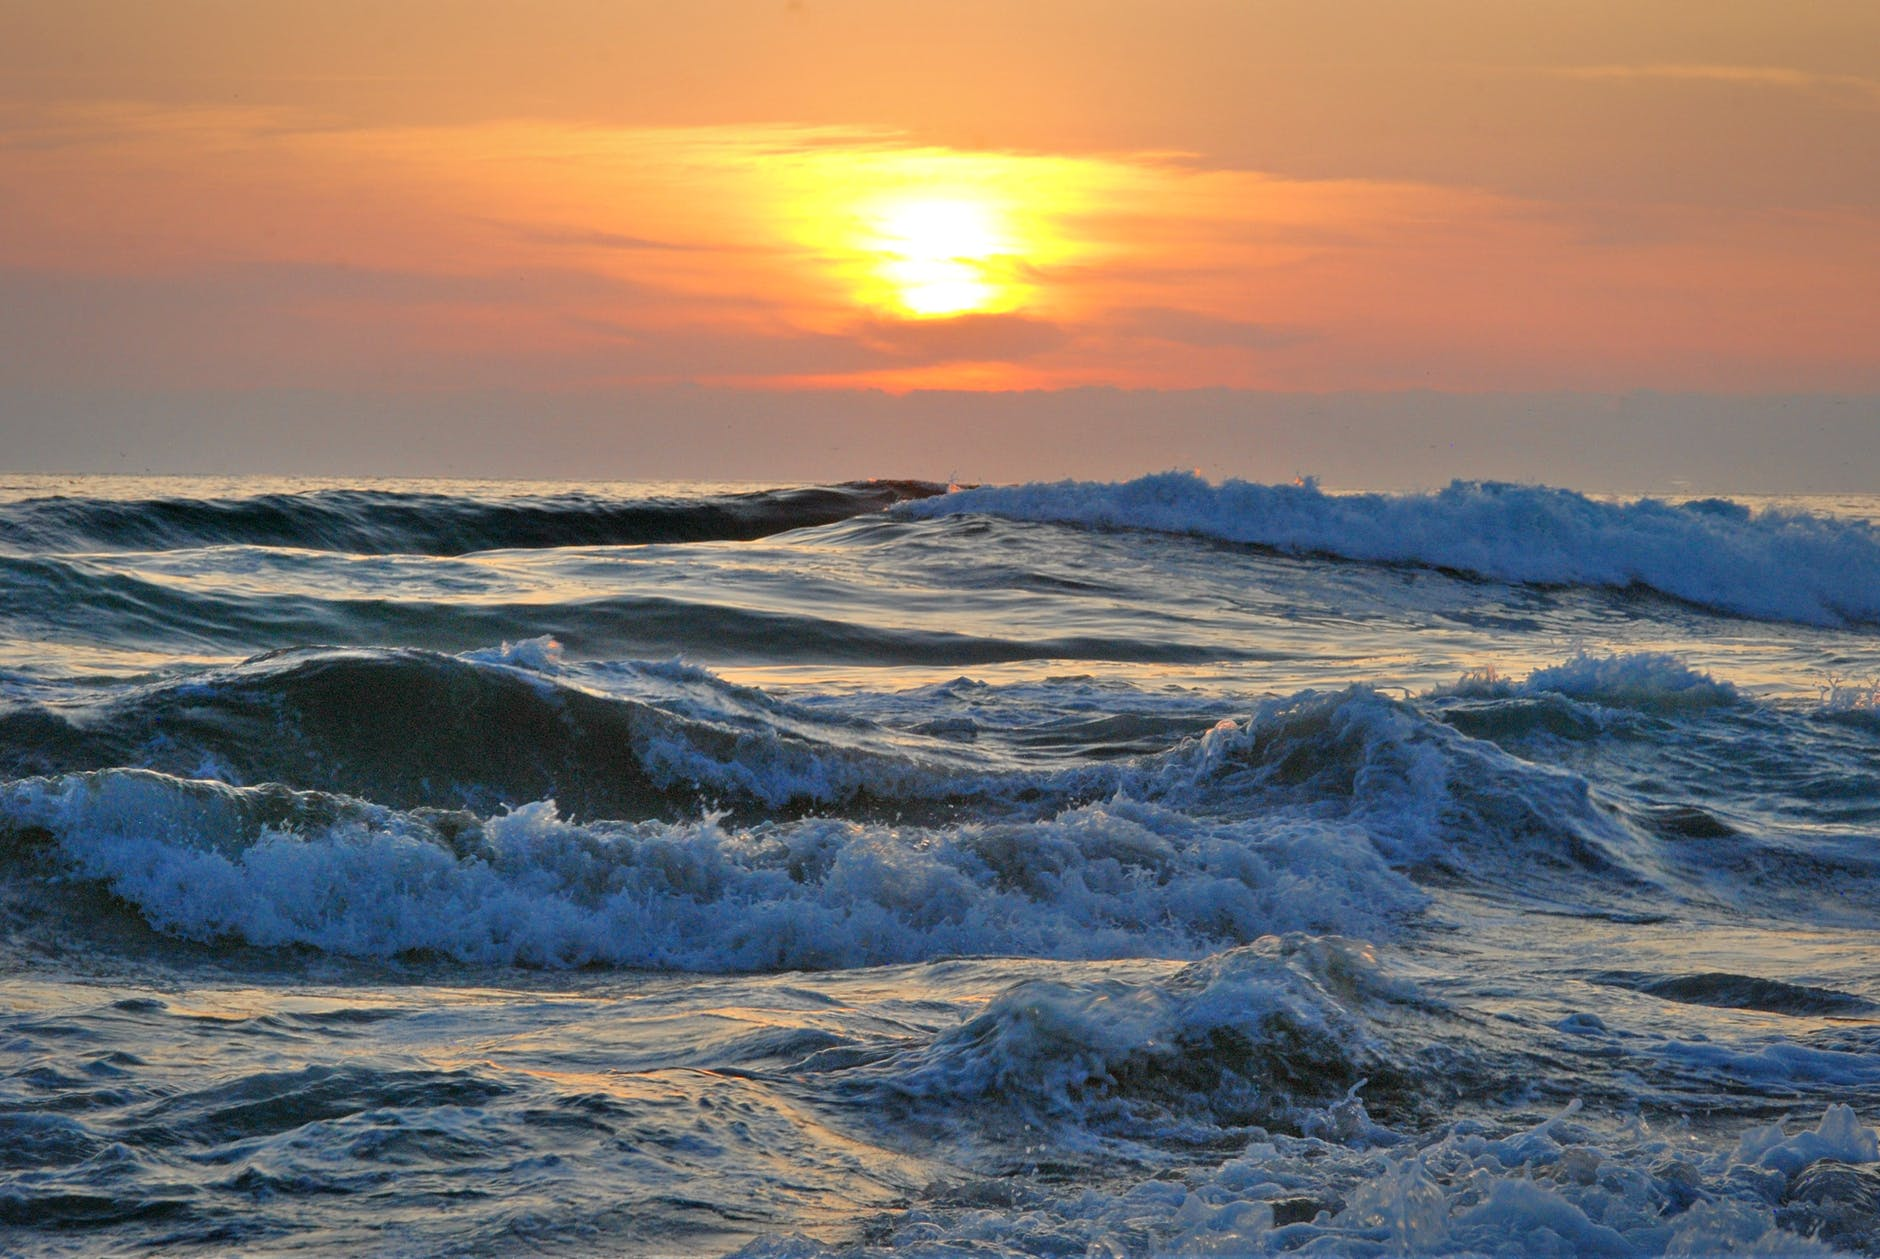 ocean water during yellow sunset